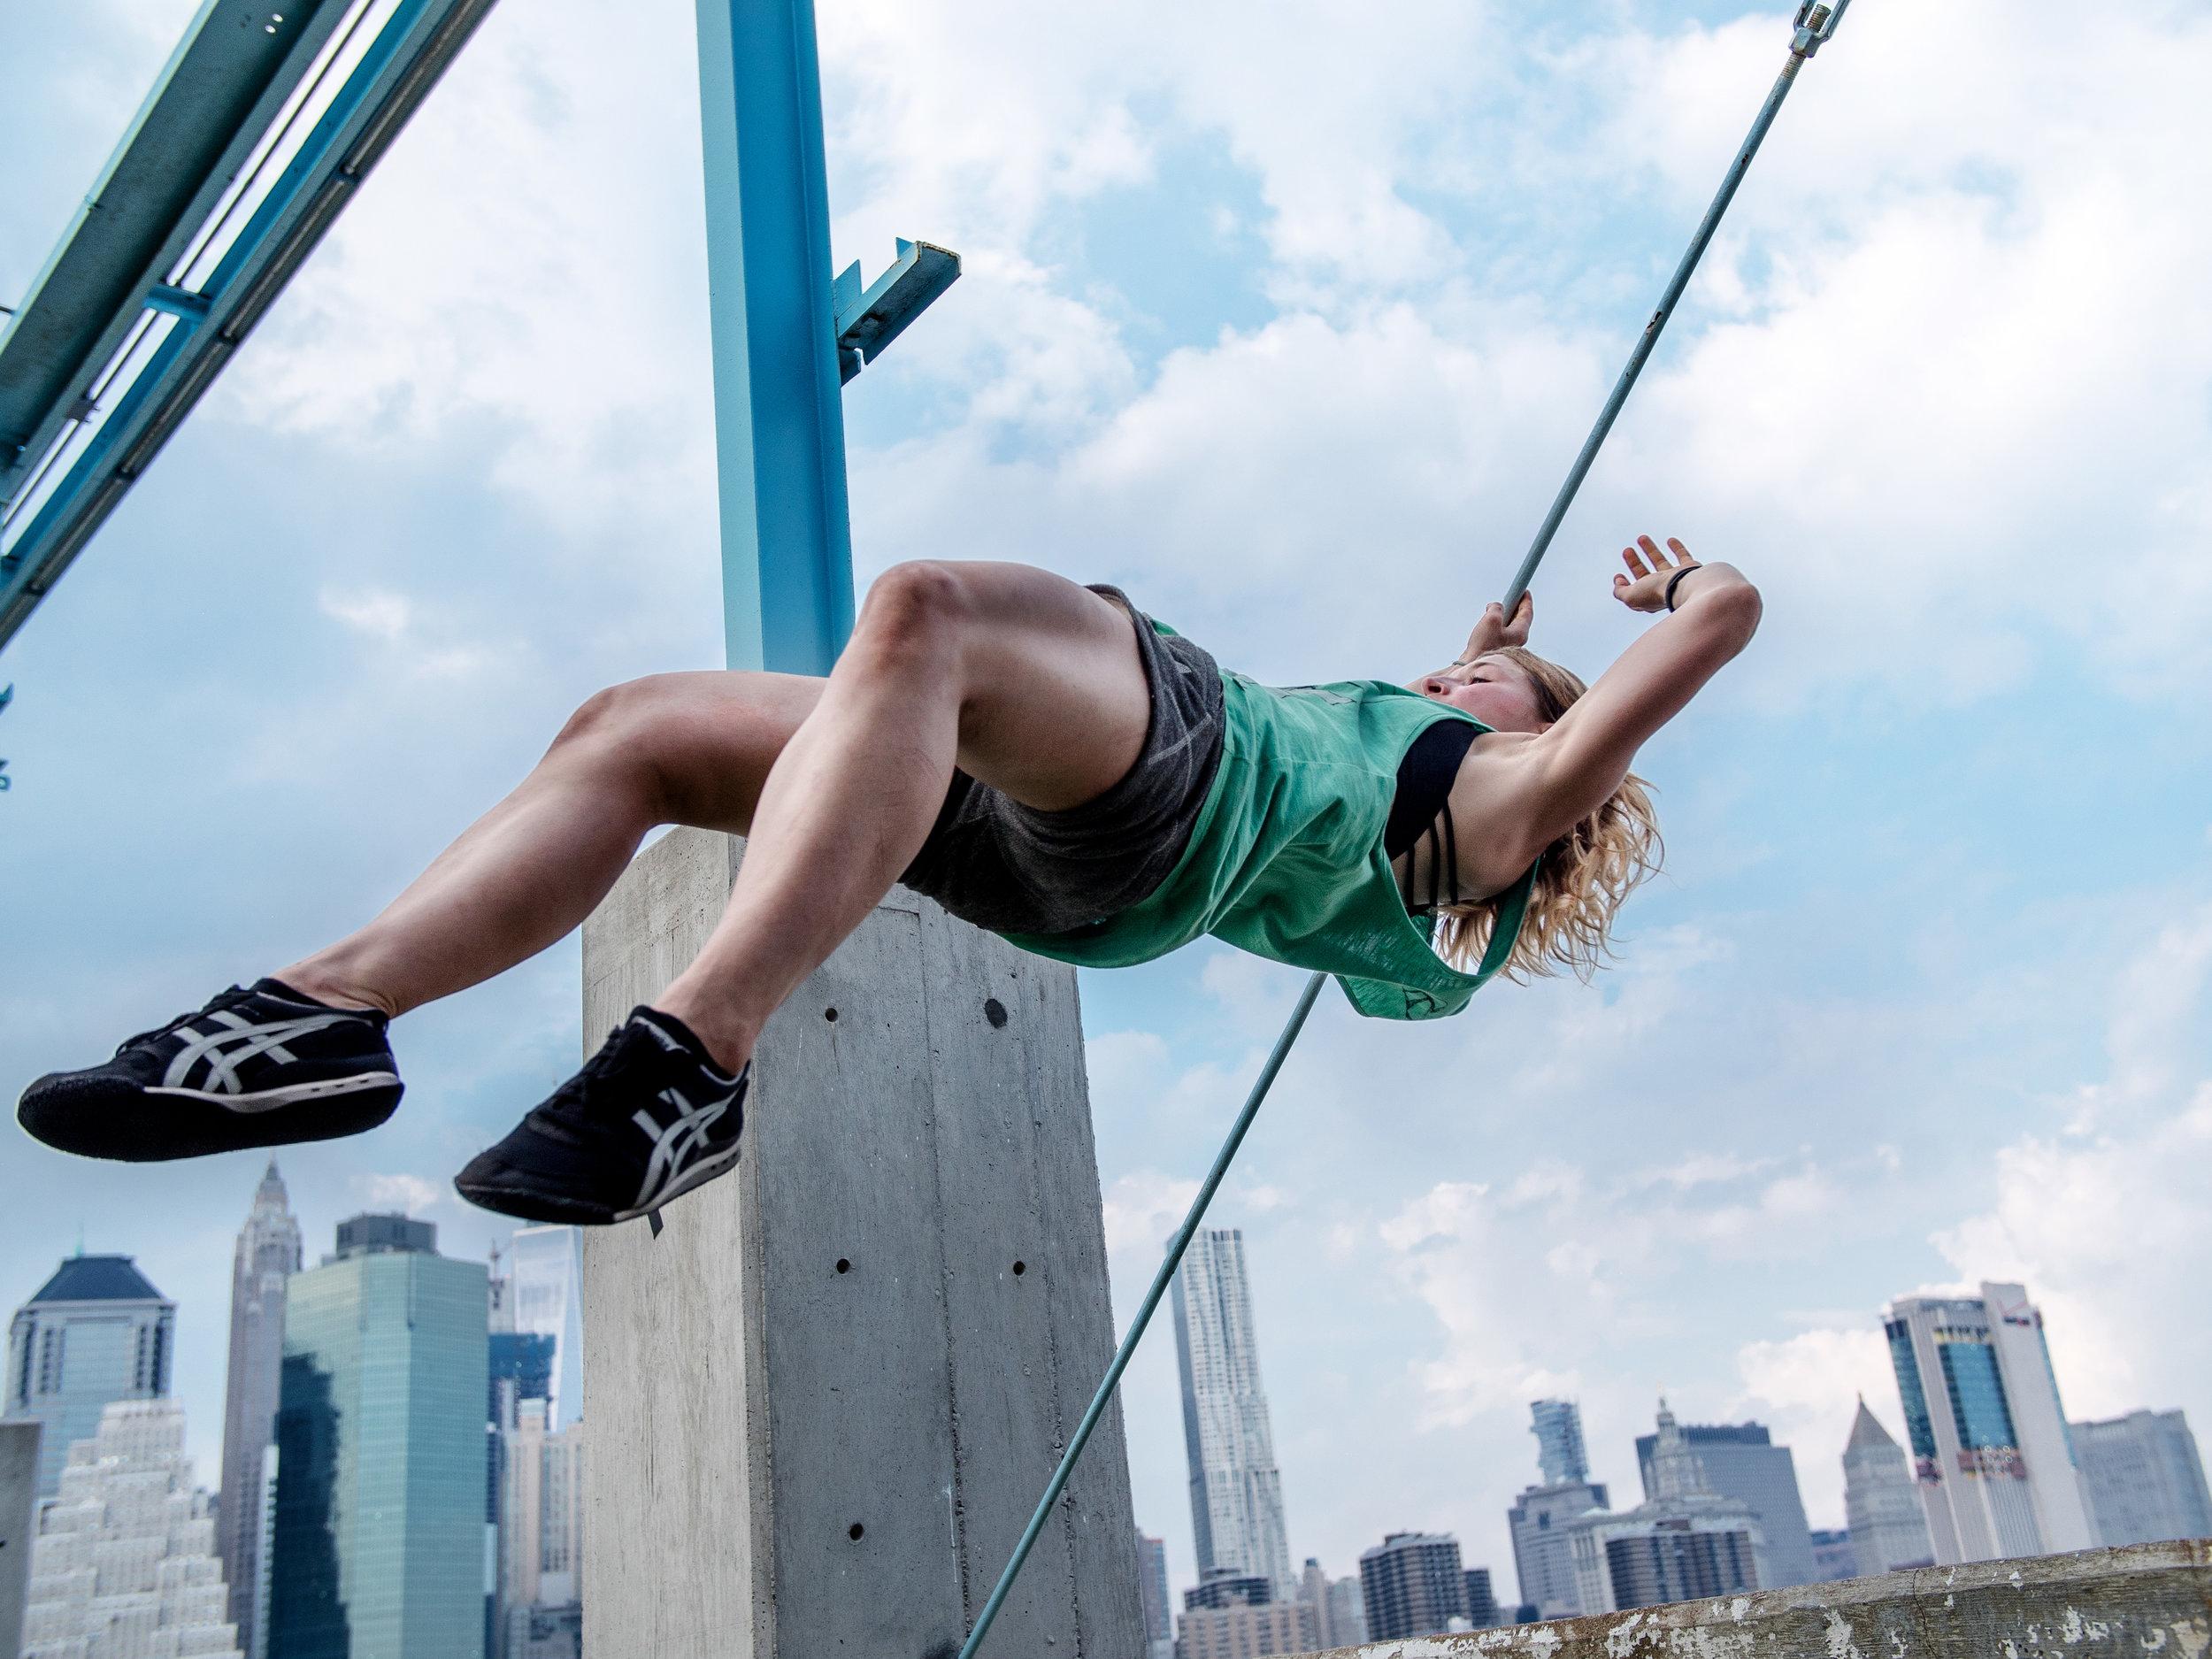 Nikkie-Zanevsky-Skochypstiks-Parkour-Freerunning-New-York-NYC-NY-Brooklyn-Steve-Zavitz-Traceuse